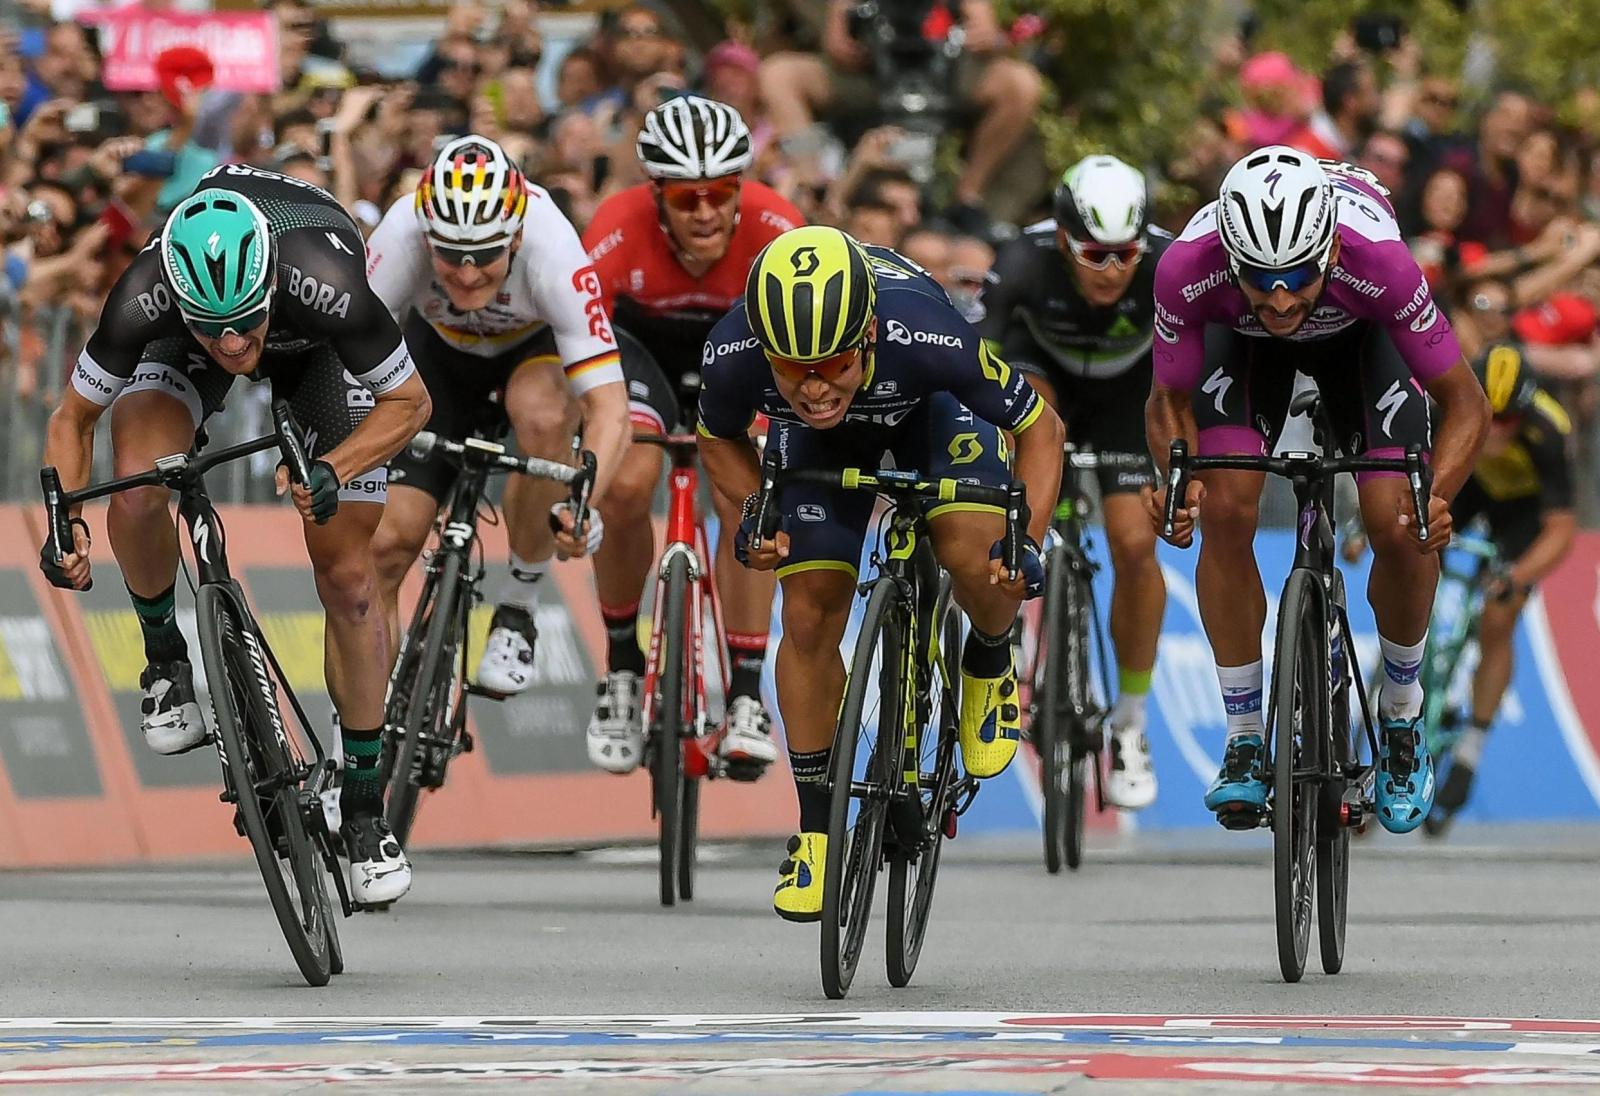 Giro d'Italia. fot. EPA/ALESSANDRO DI MEO